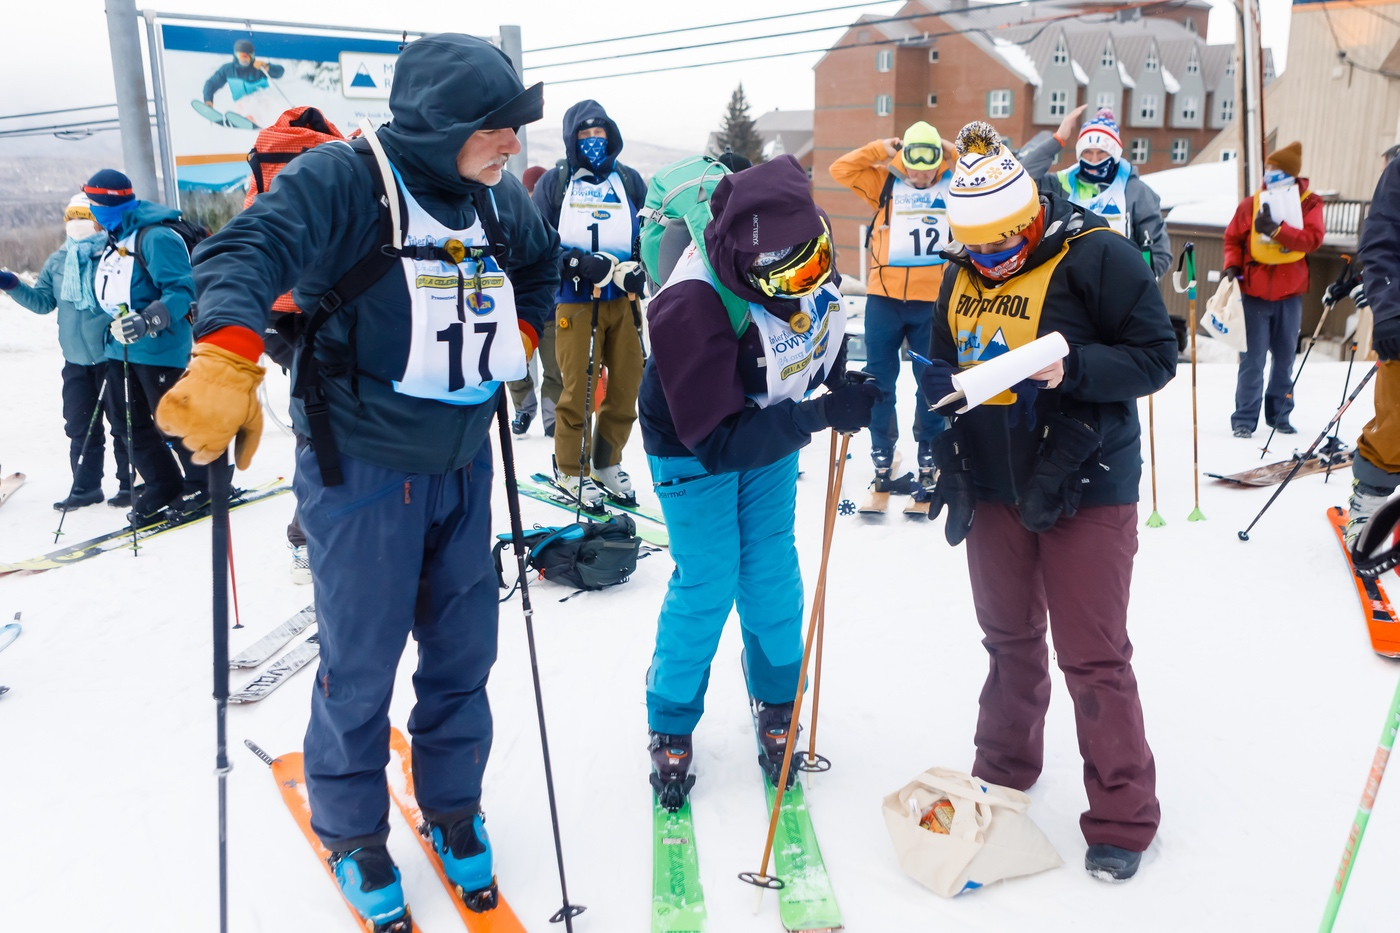 WinterKids Downhill 24 2021 SDP 3668